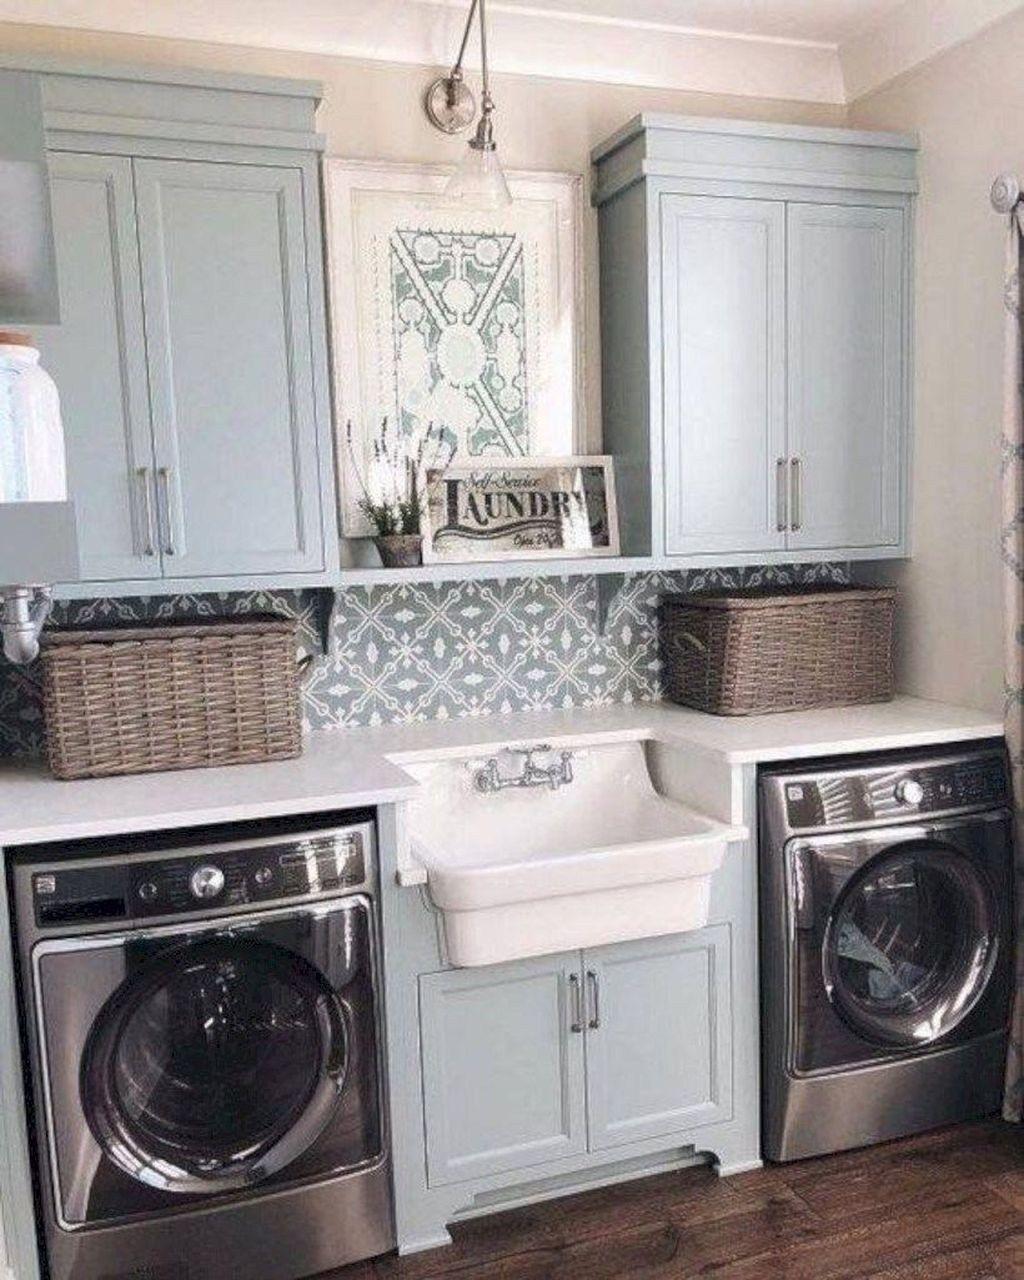 Wonderful Basement Laundry Room Remodel Ideas 02 - TRENDEHOUZZ